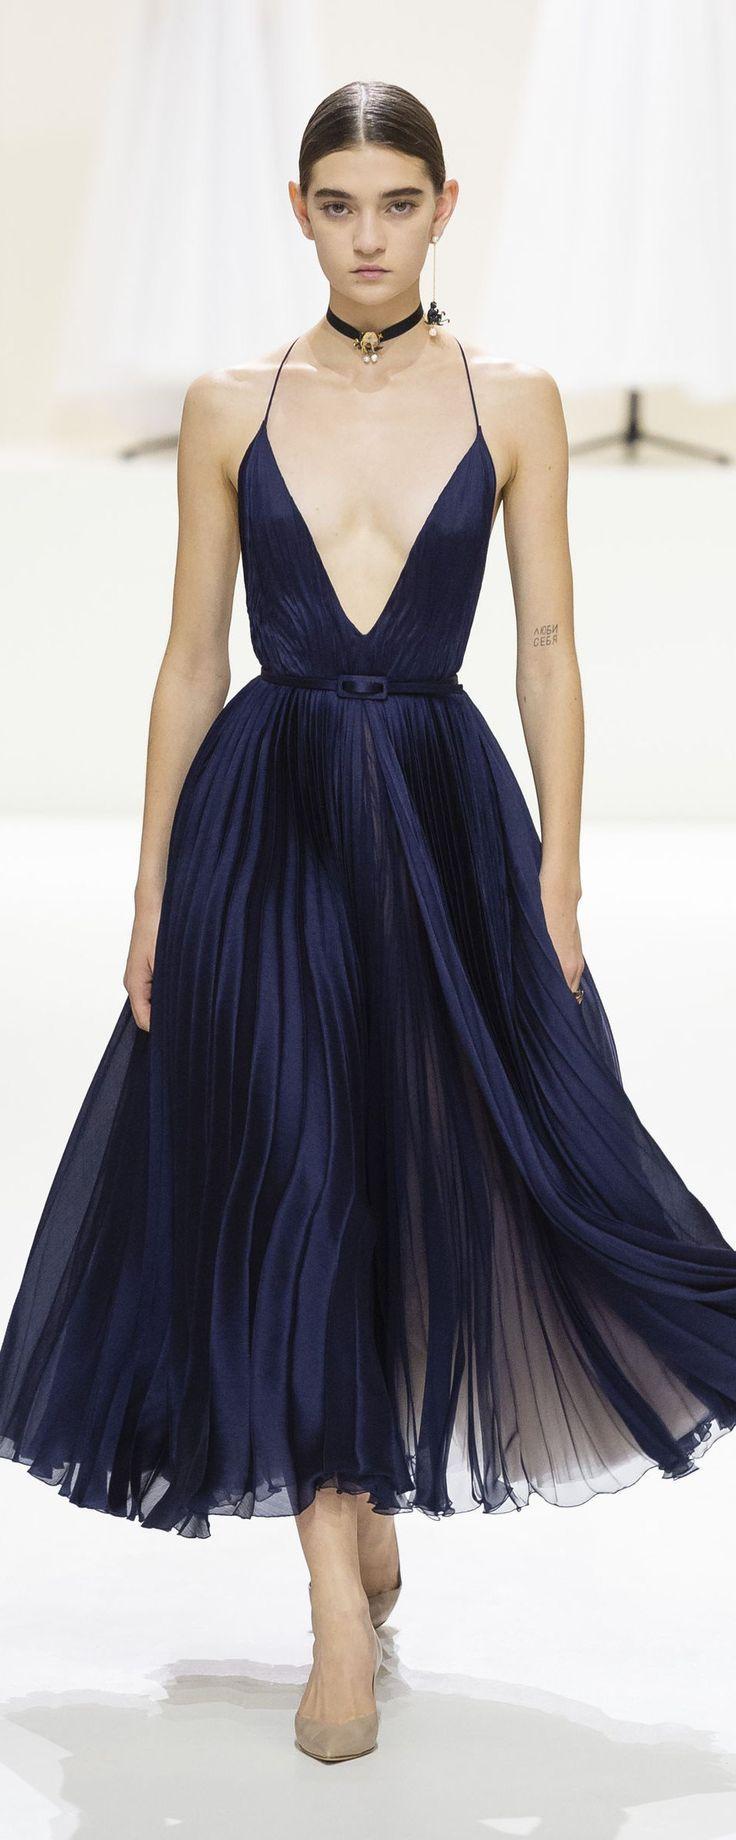 Christian Dior Fallwinter 20182019 Haute couture en